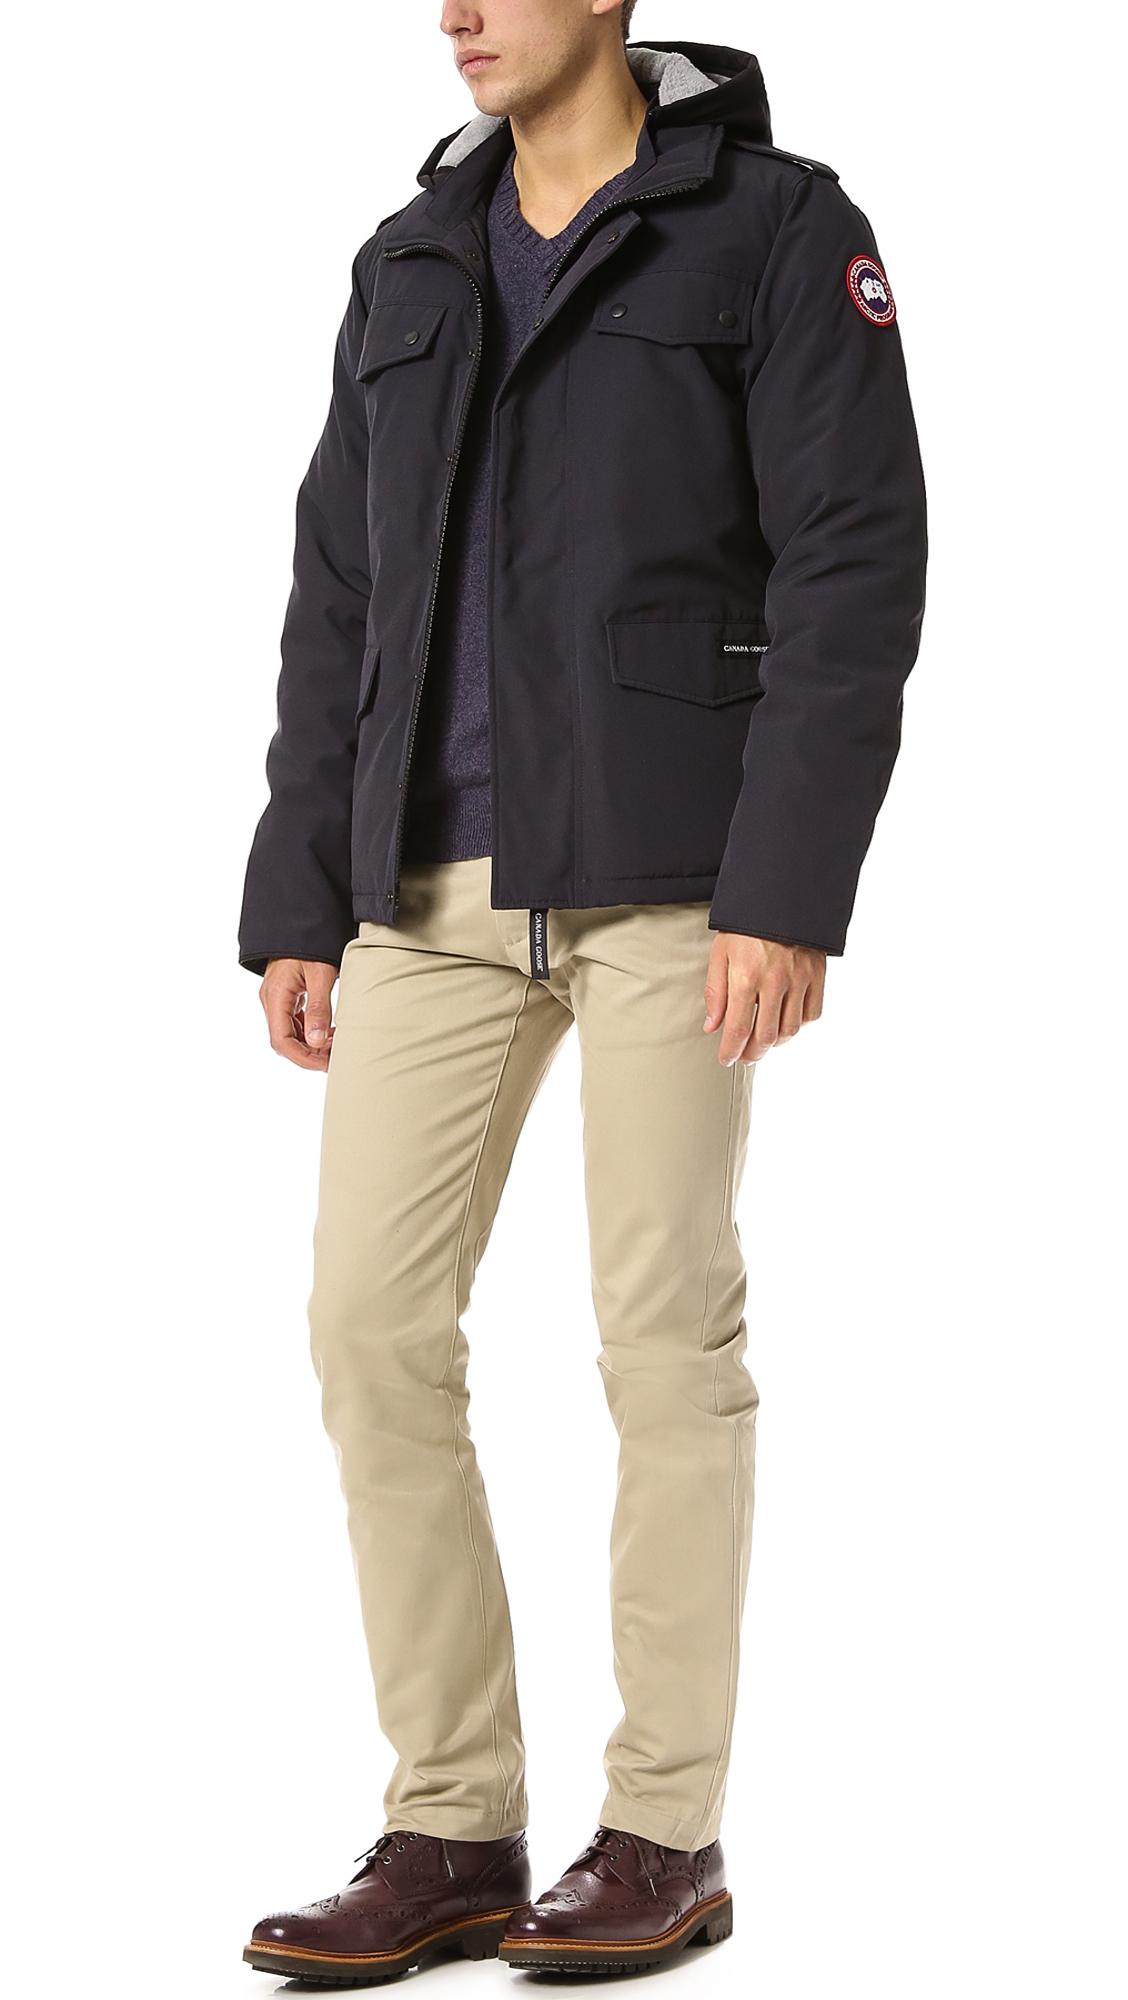 Canada Goose langford parka replica shop - Canada Goose Burnett Jacket | EAST DANE